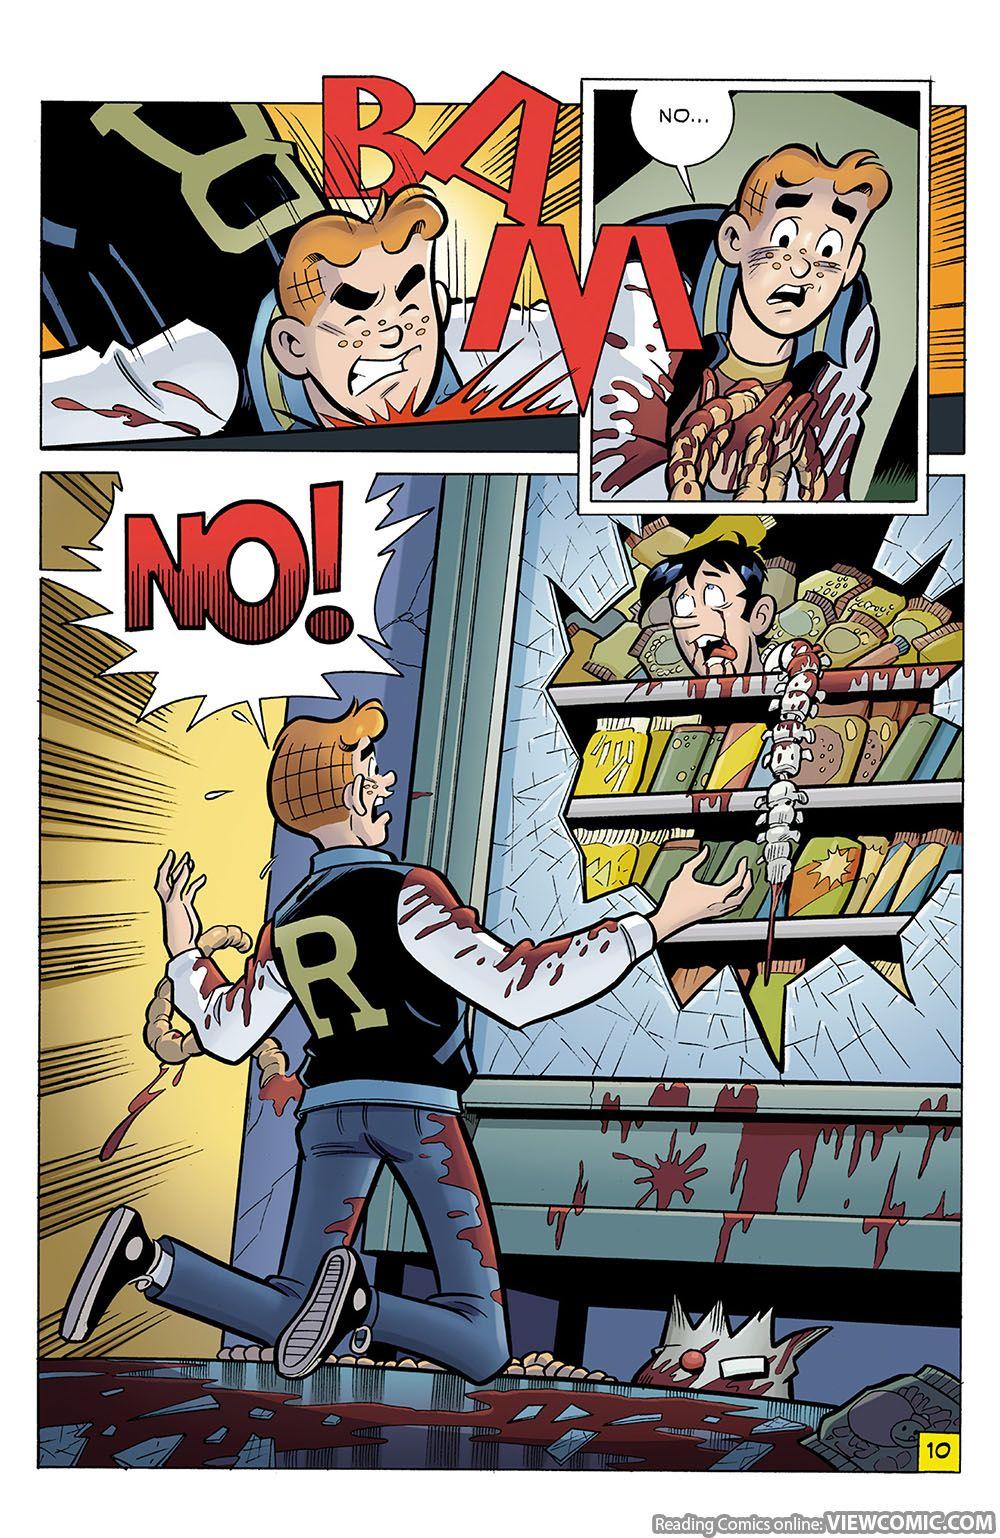 Archie comics archie comics sneak peek of the week major spoilers - Archie Comics May 2016 Archie Vs Predator 03 Of 04 2015